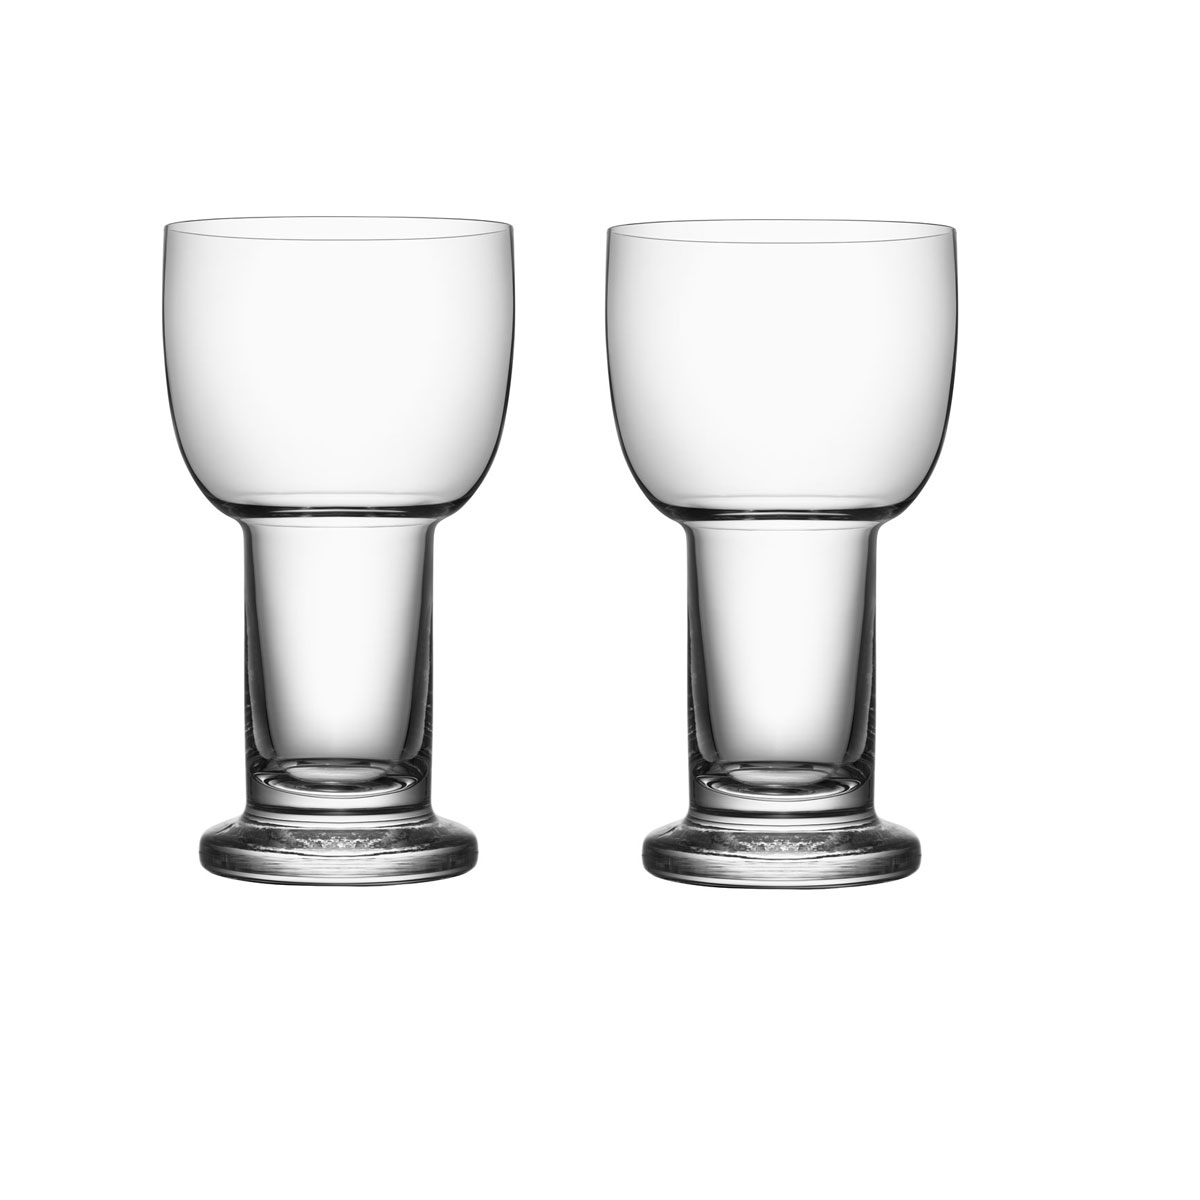 Kosta Boda Picnic Small Glasses Pair